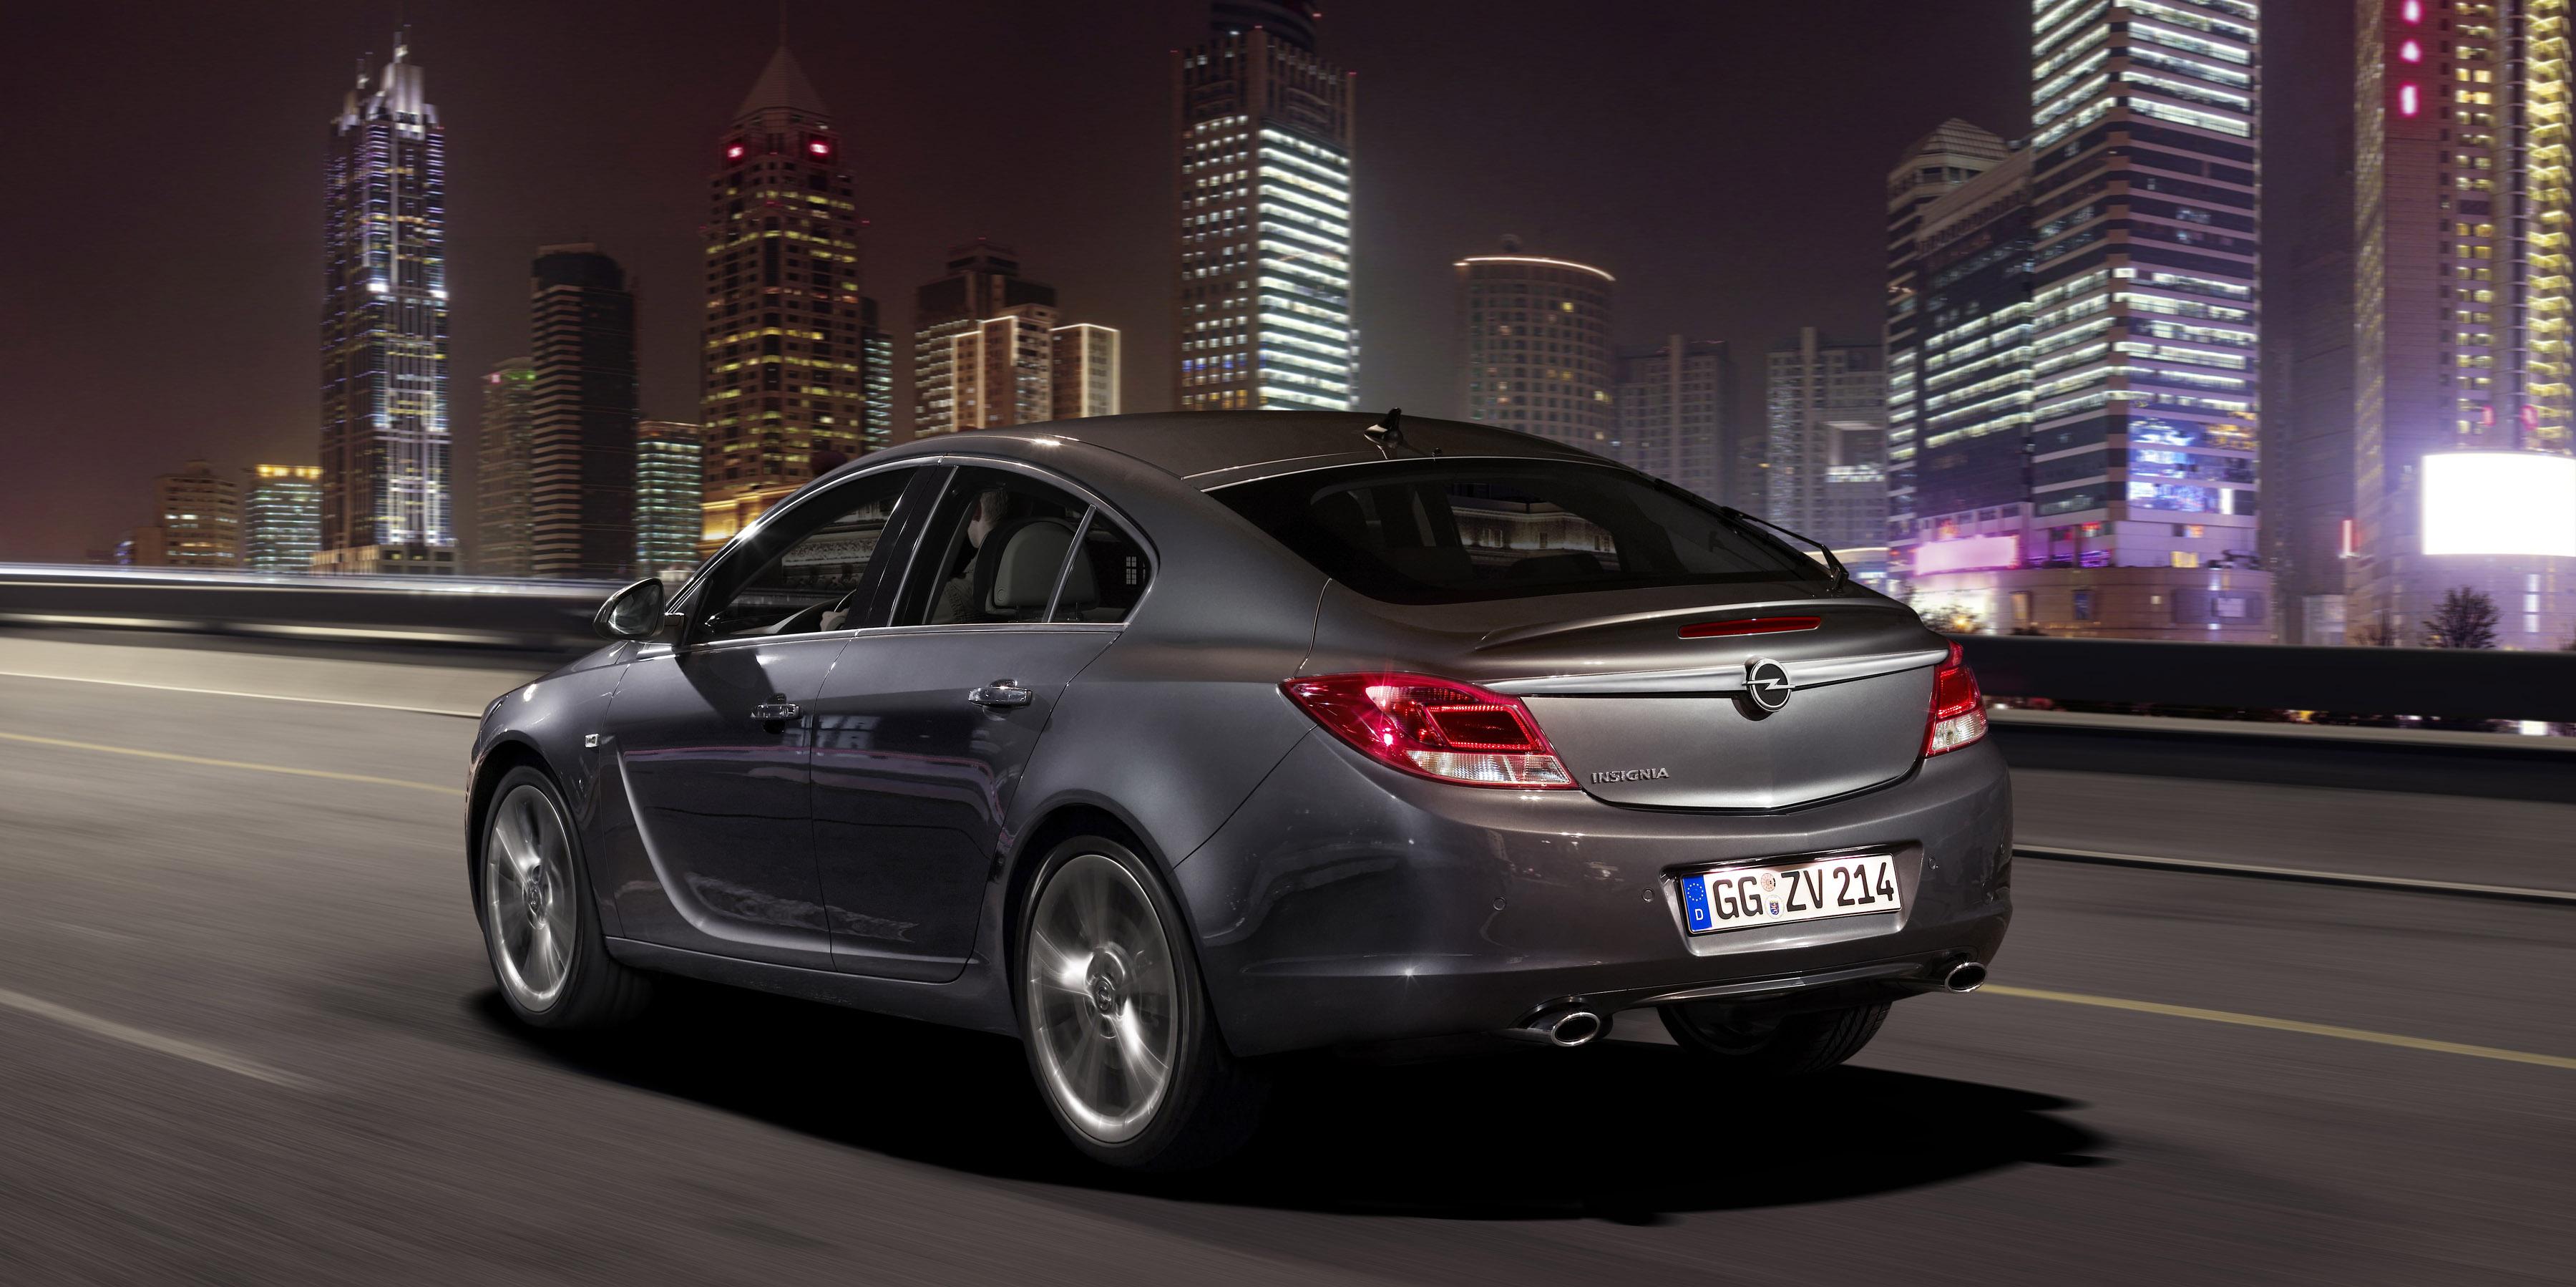 Opel Insignia I 2008 - 2013 Liftback #1